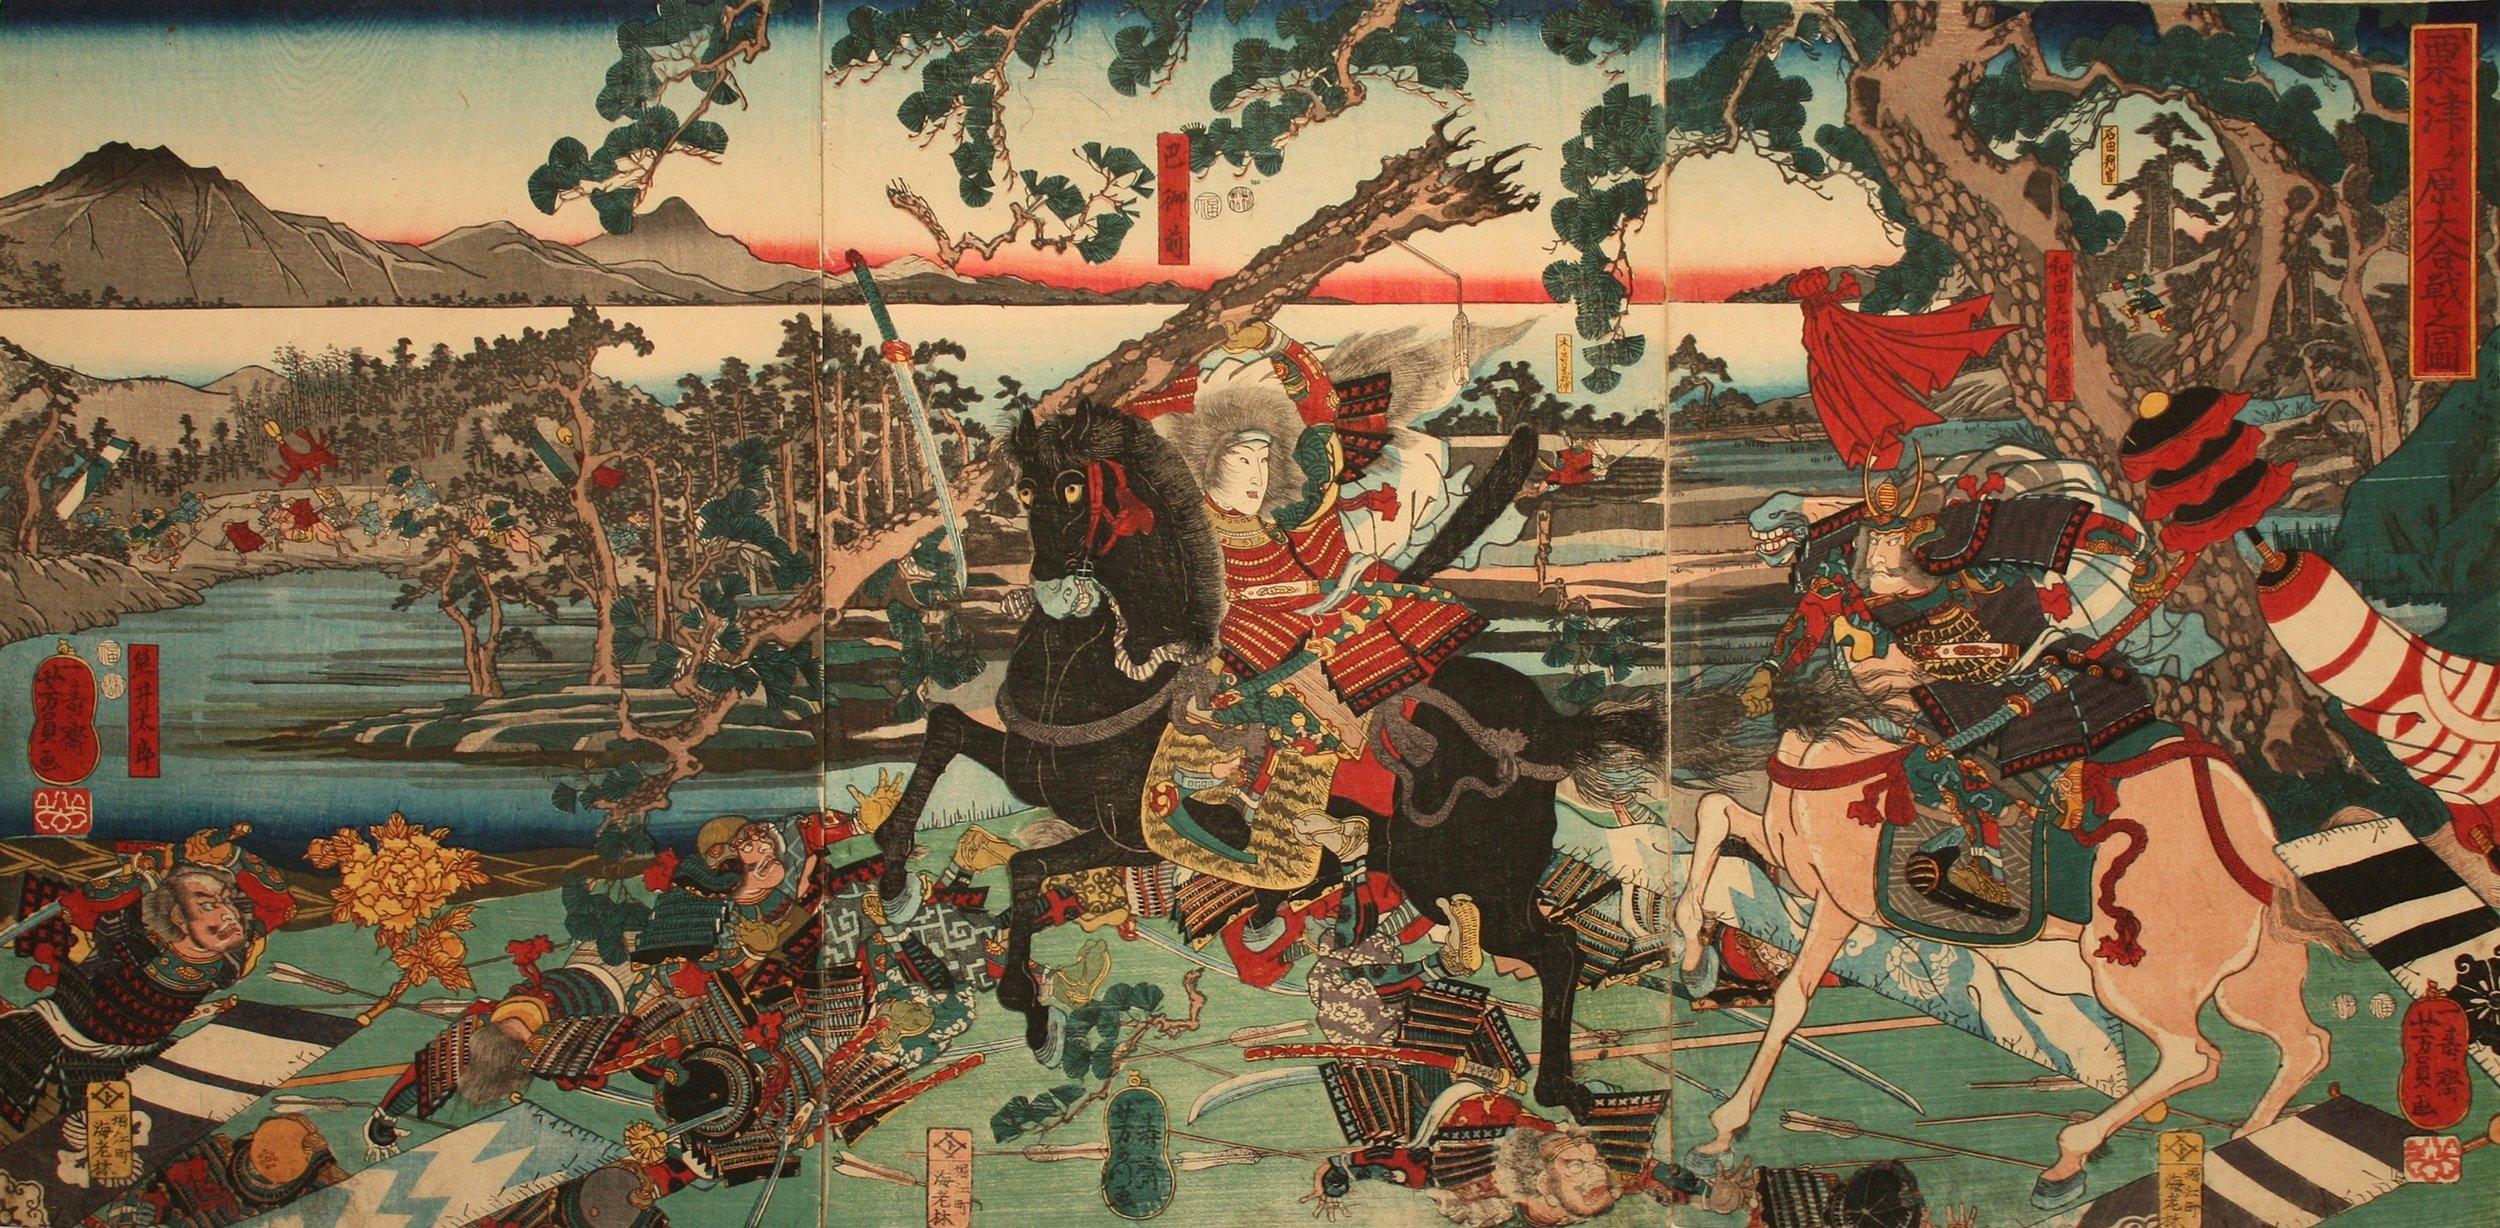 Tomoe Gozen (center) at the Battle of Awazu